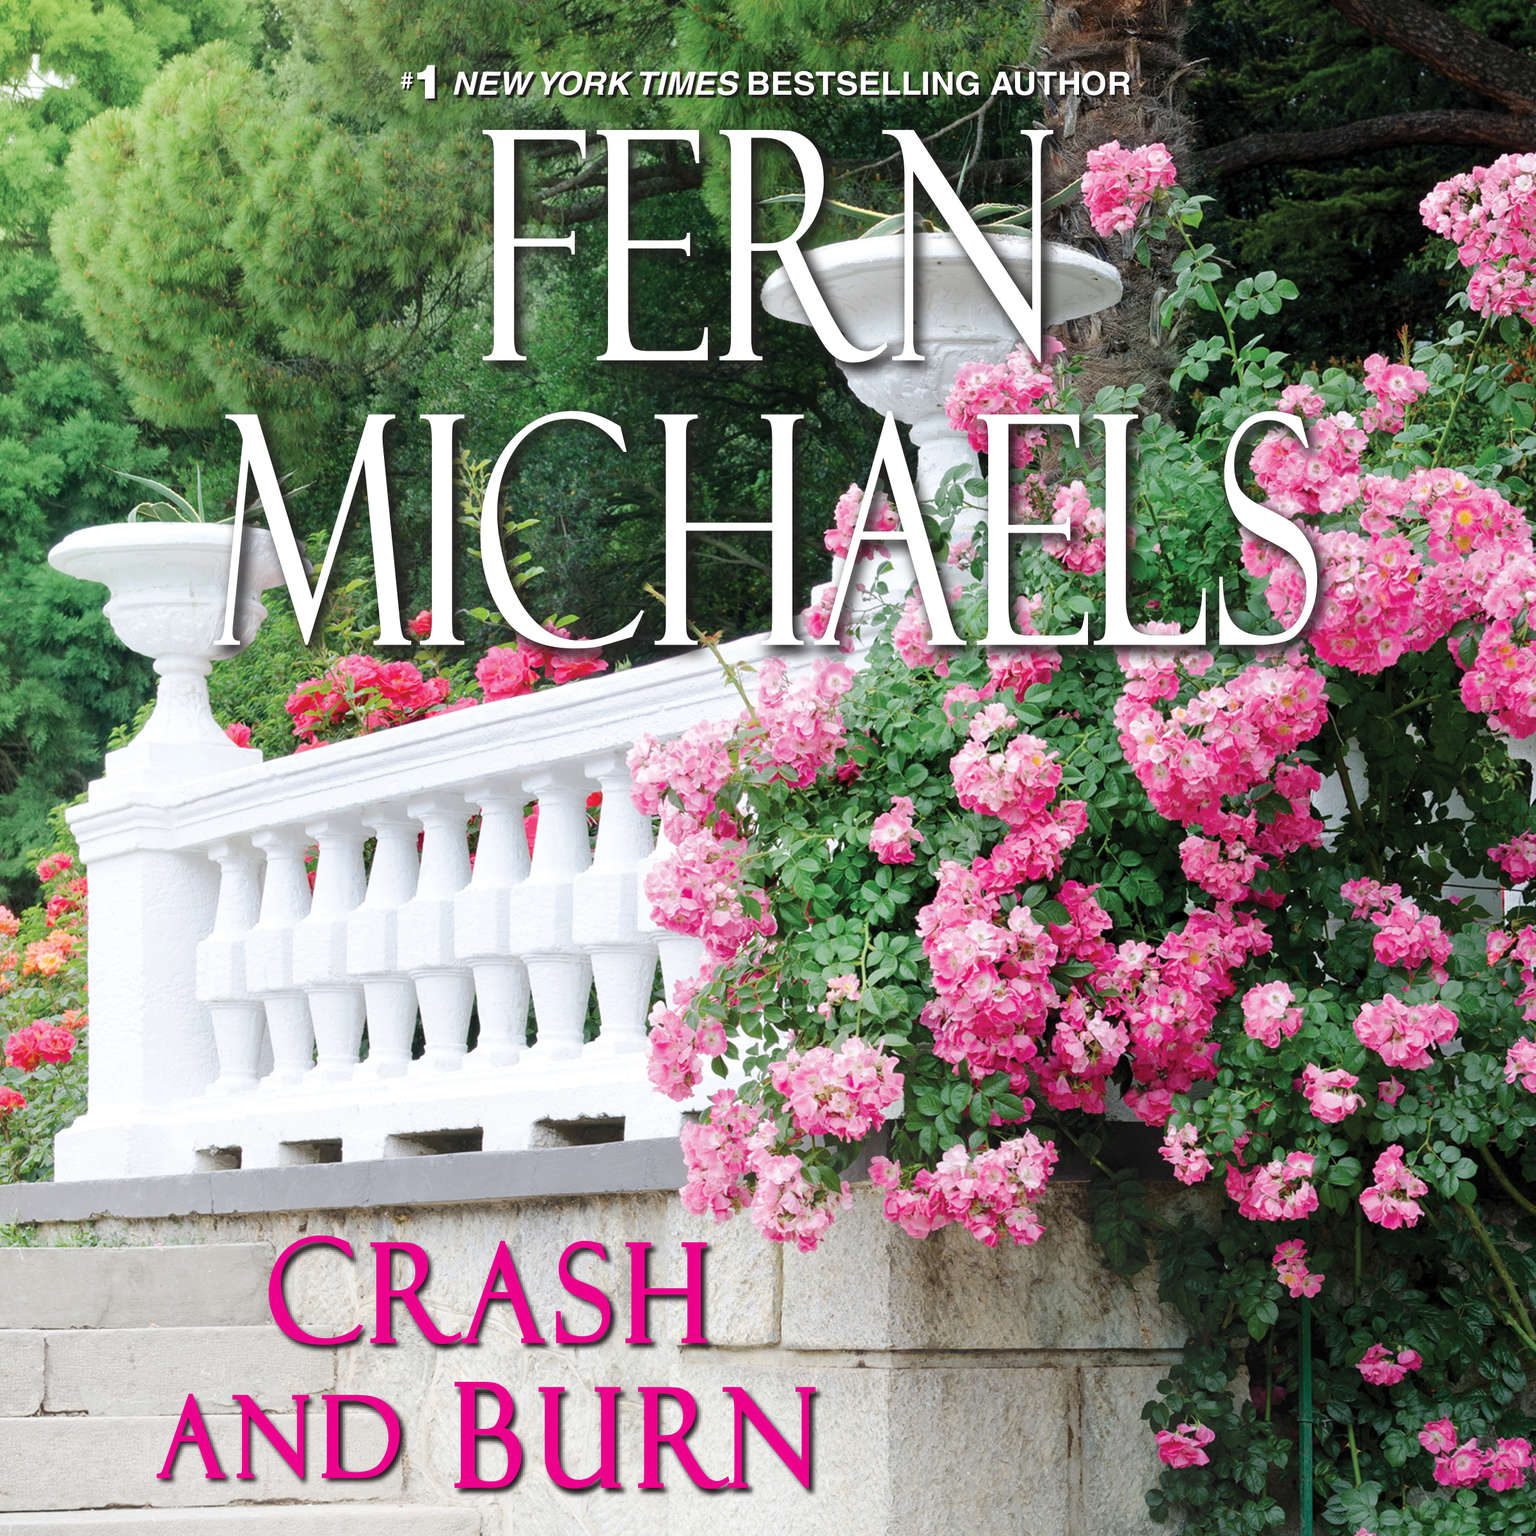 Crash and Burn Audiobook, by Fern Michaels